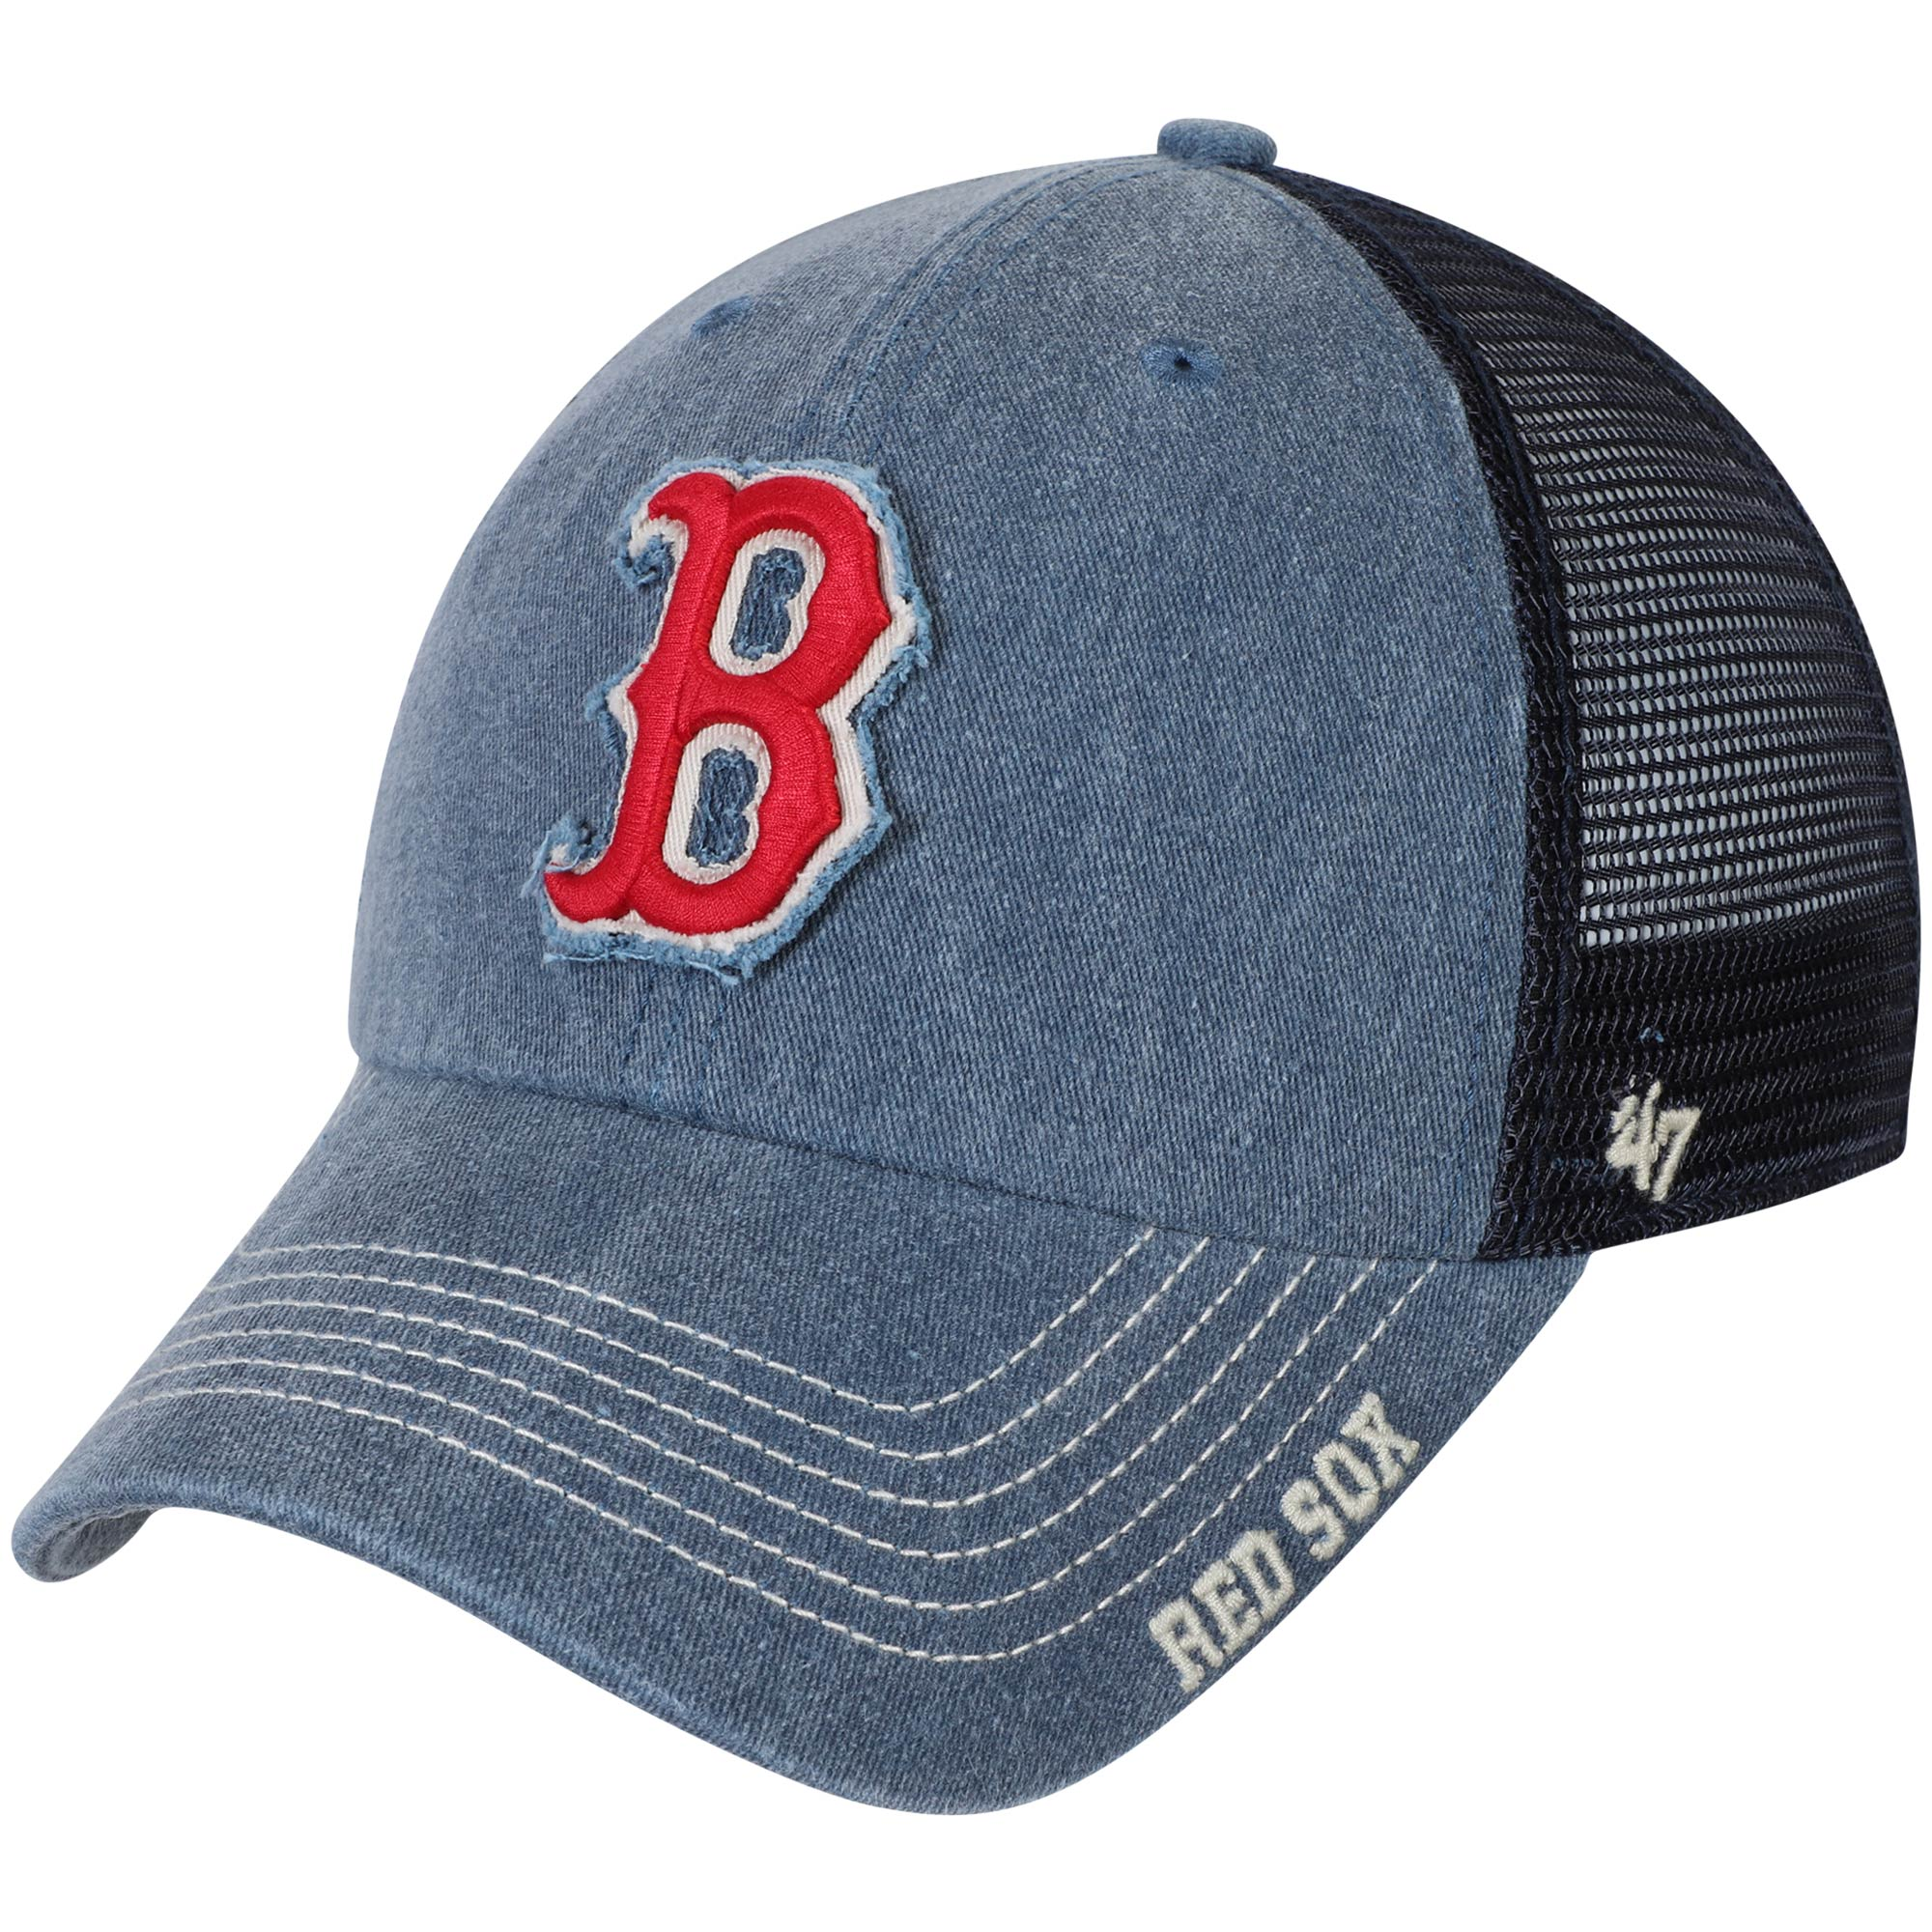 Boston Red Sox '47 Burnstead Clean Up Trucker Adjustable Hat - Navy - OSFA